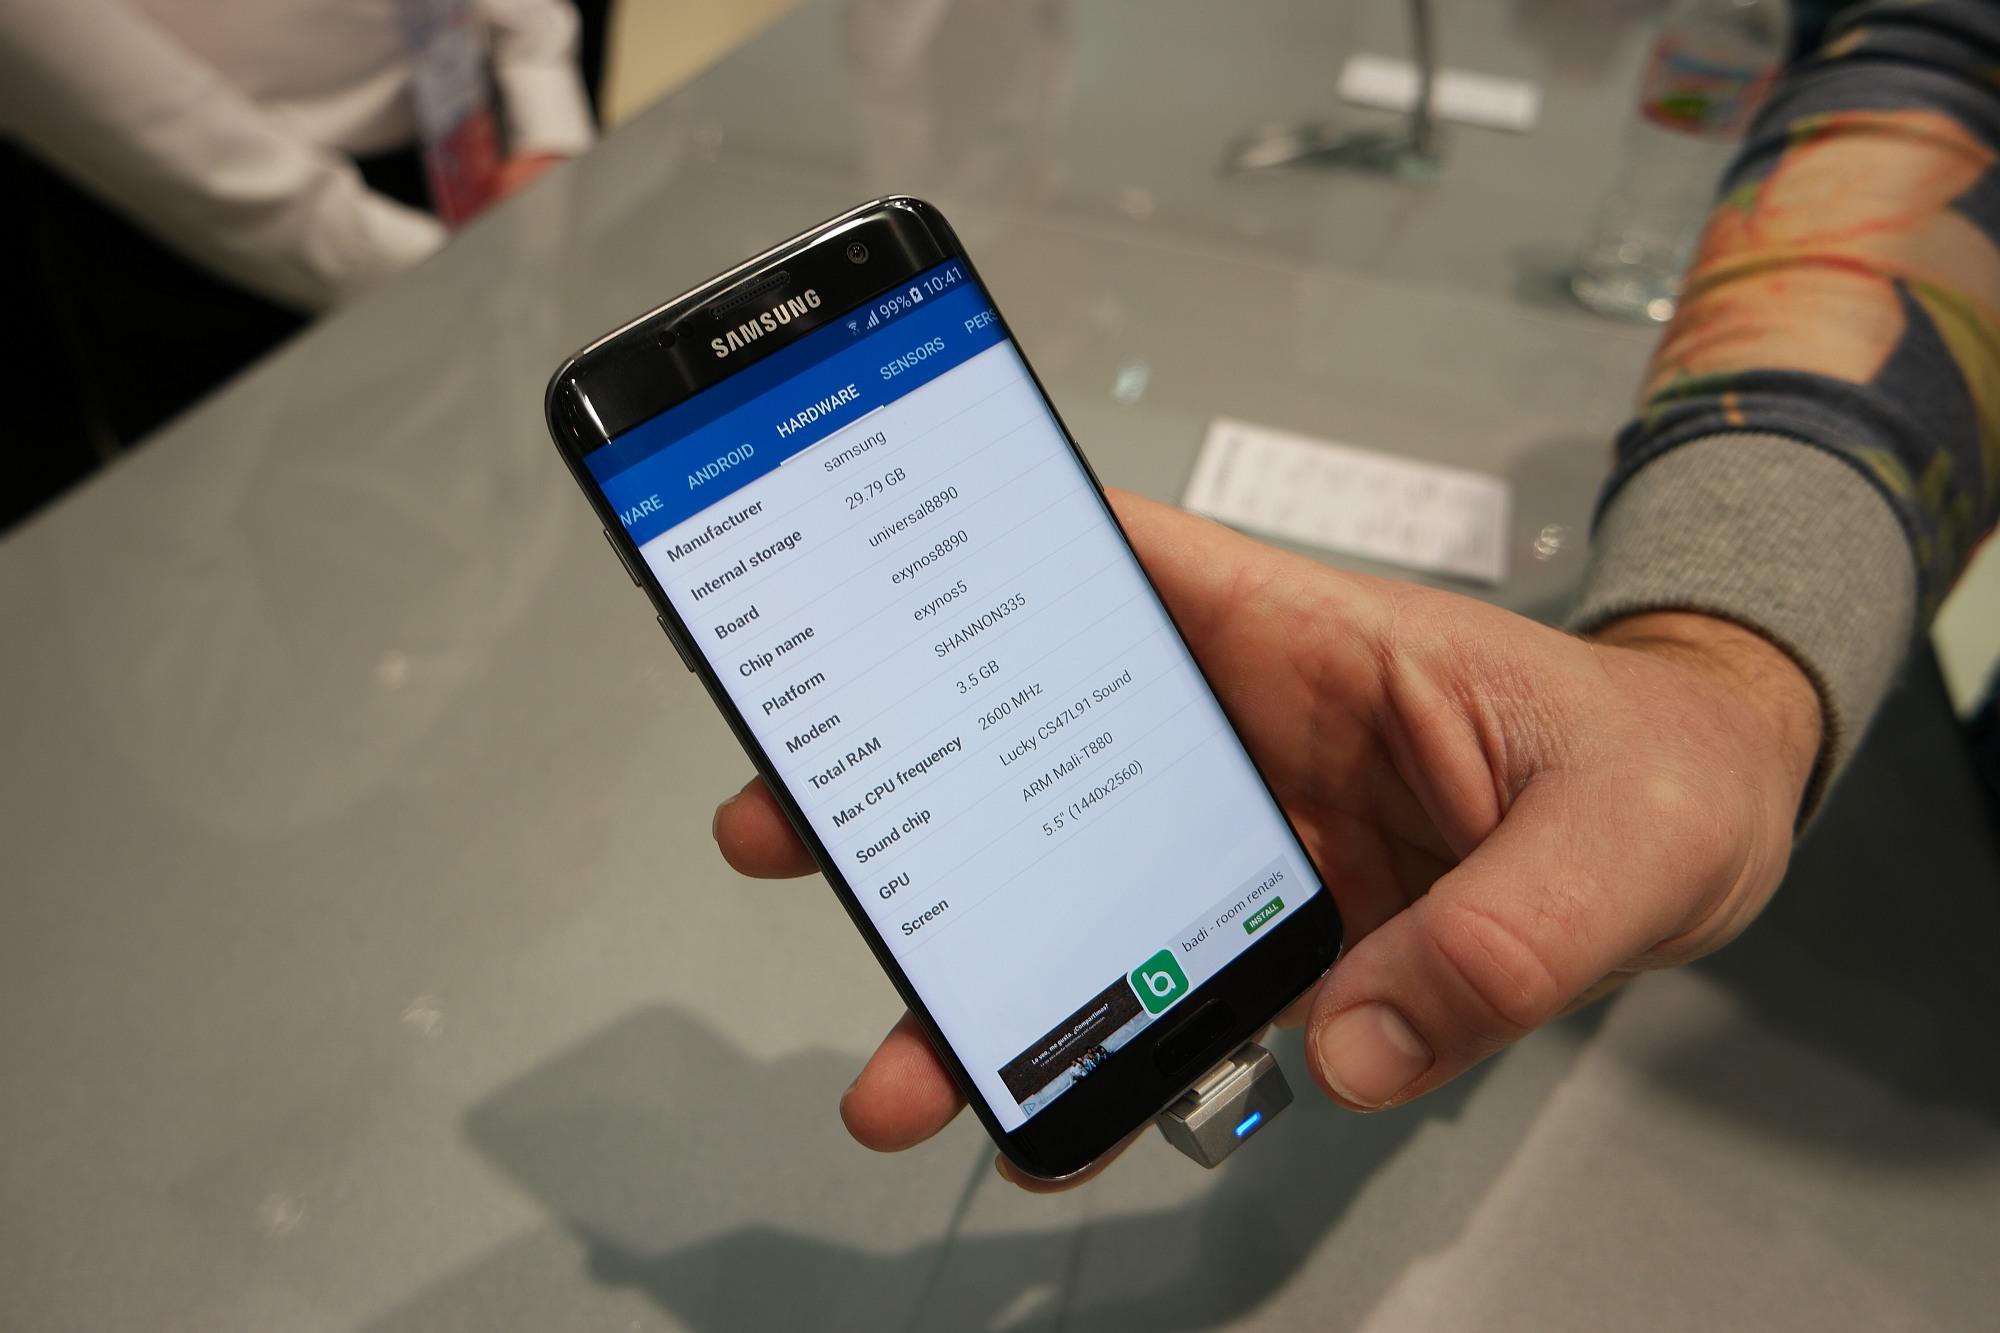 Galaxy S7 and Galaxy S7 edge use Sony IMX260 camera sensor